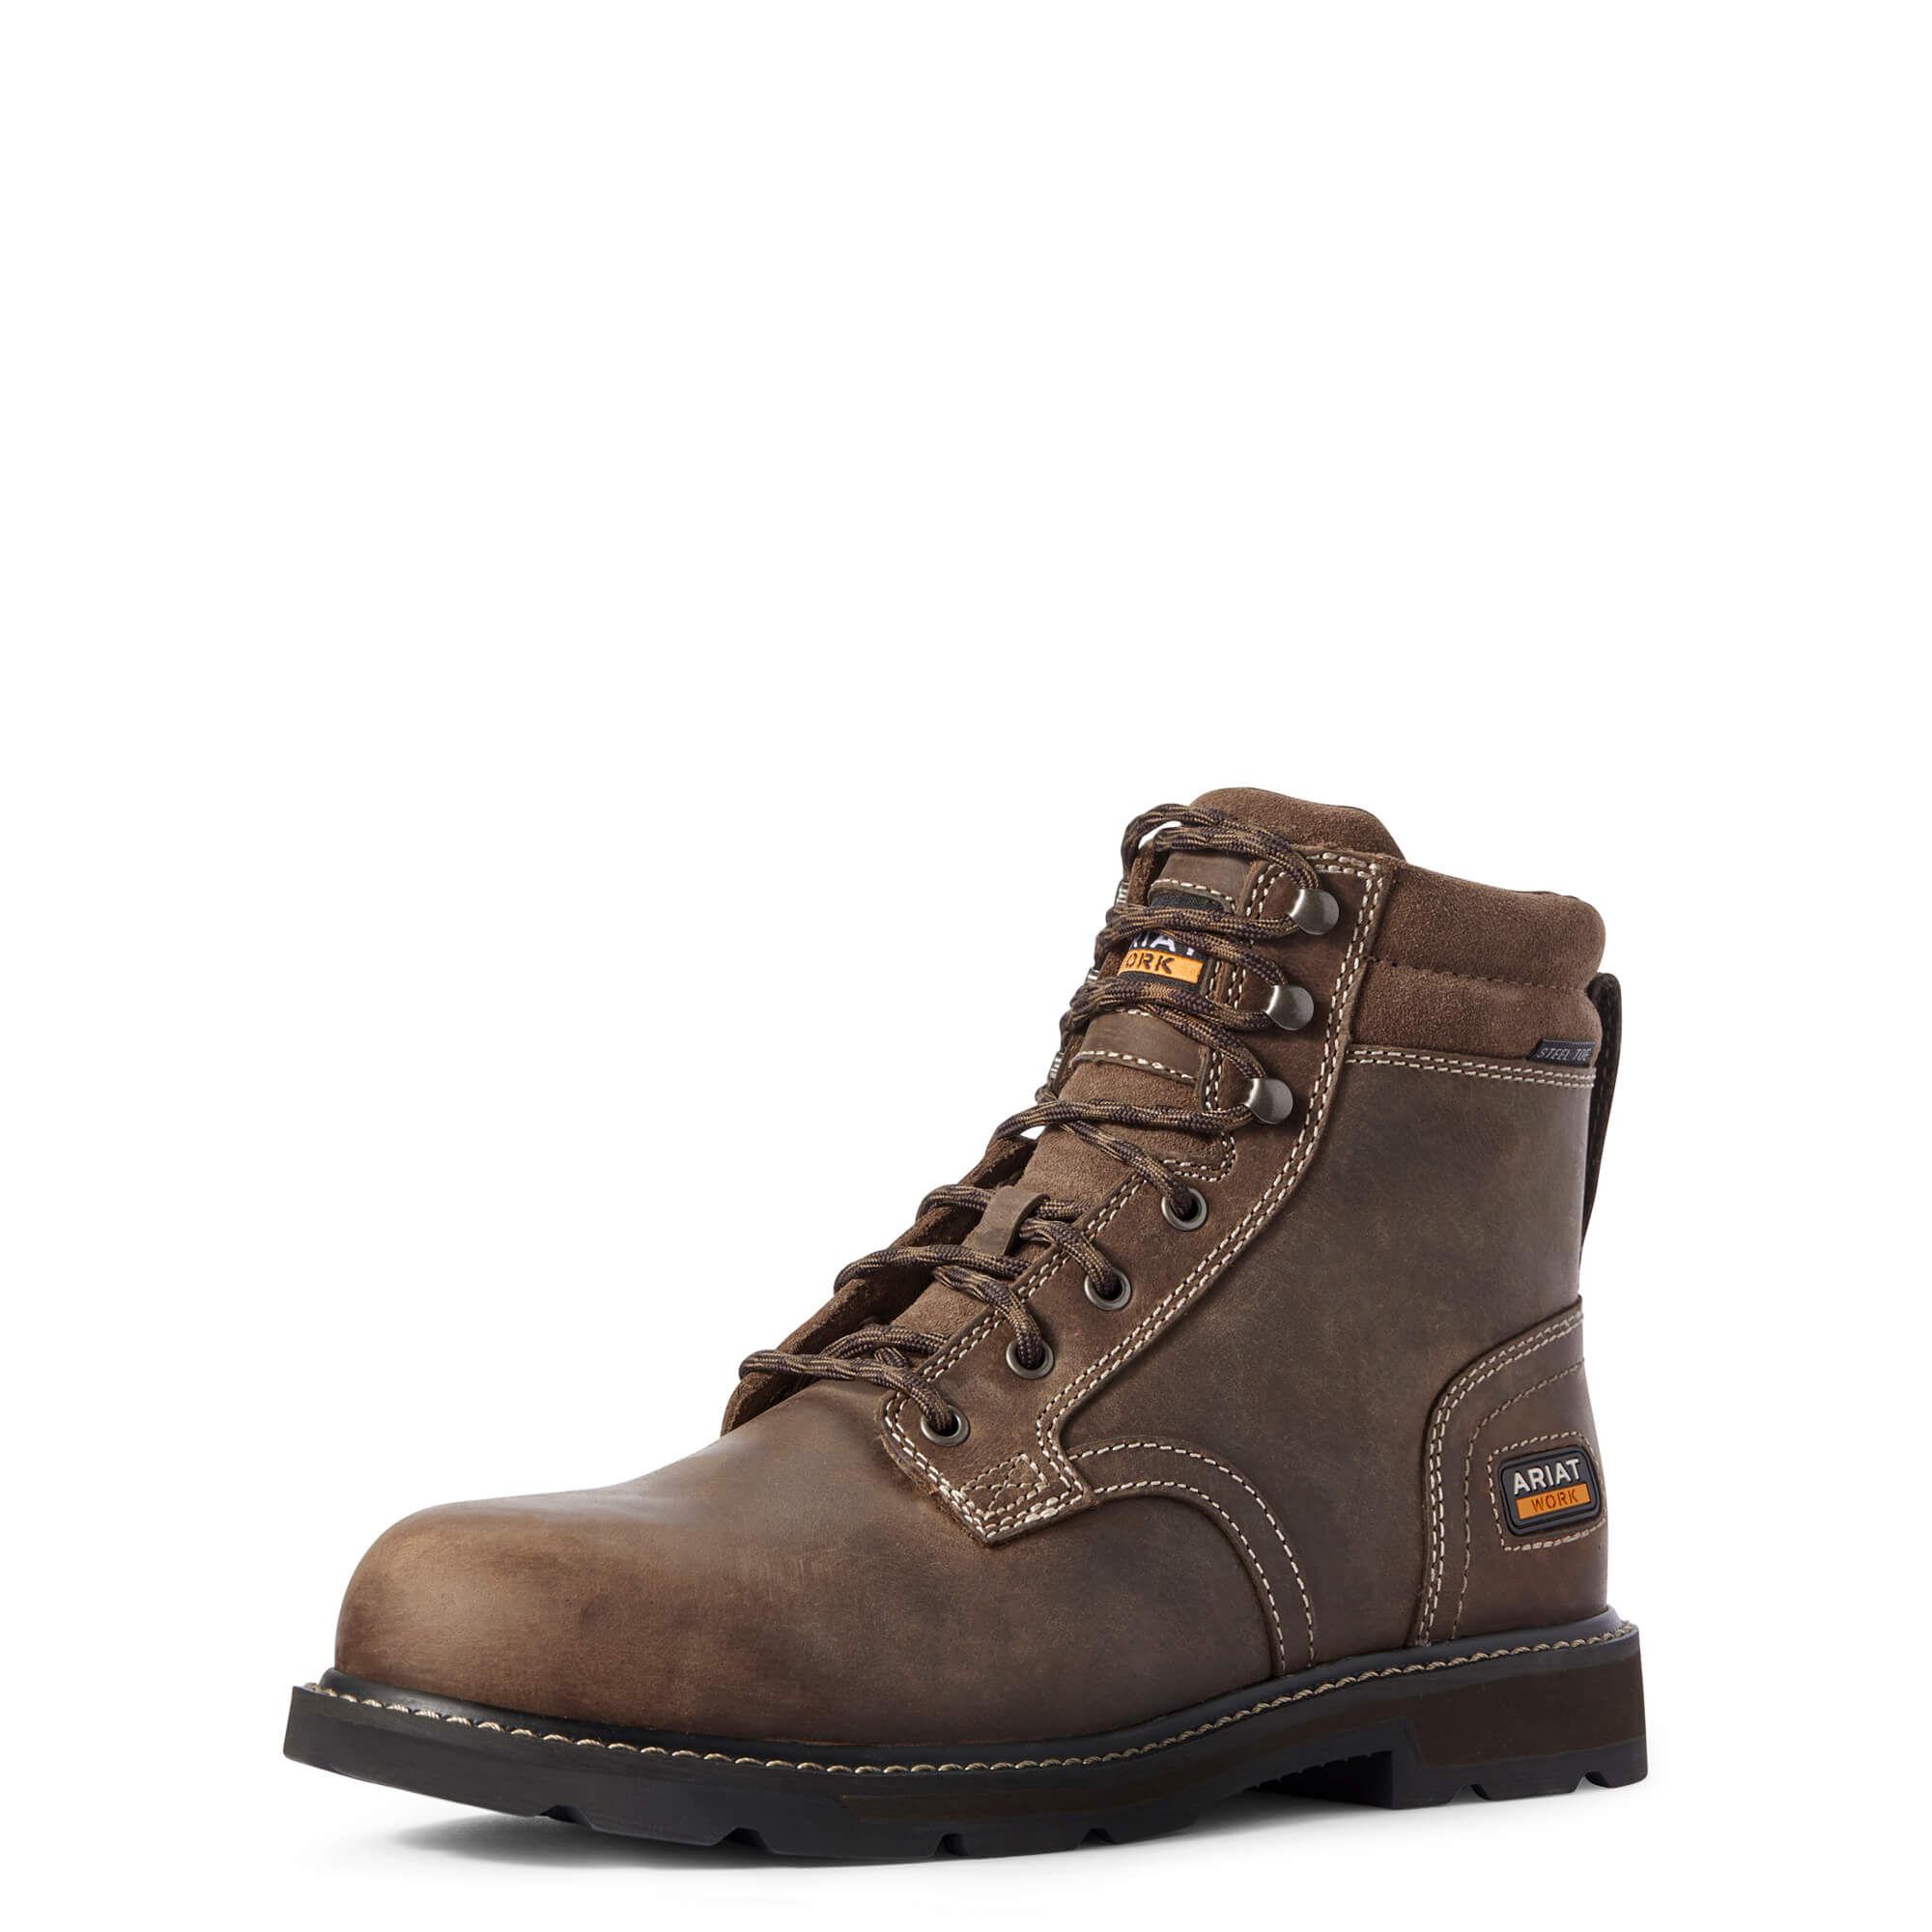 Men's Work Boots - All Men's Work Boots